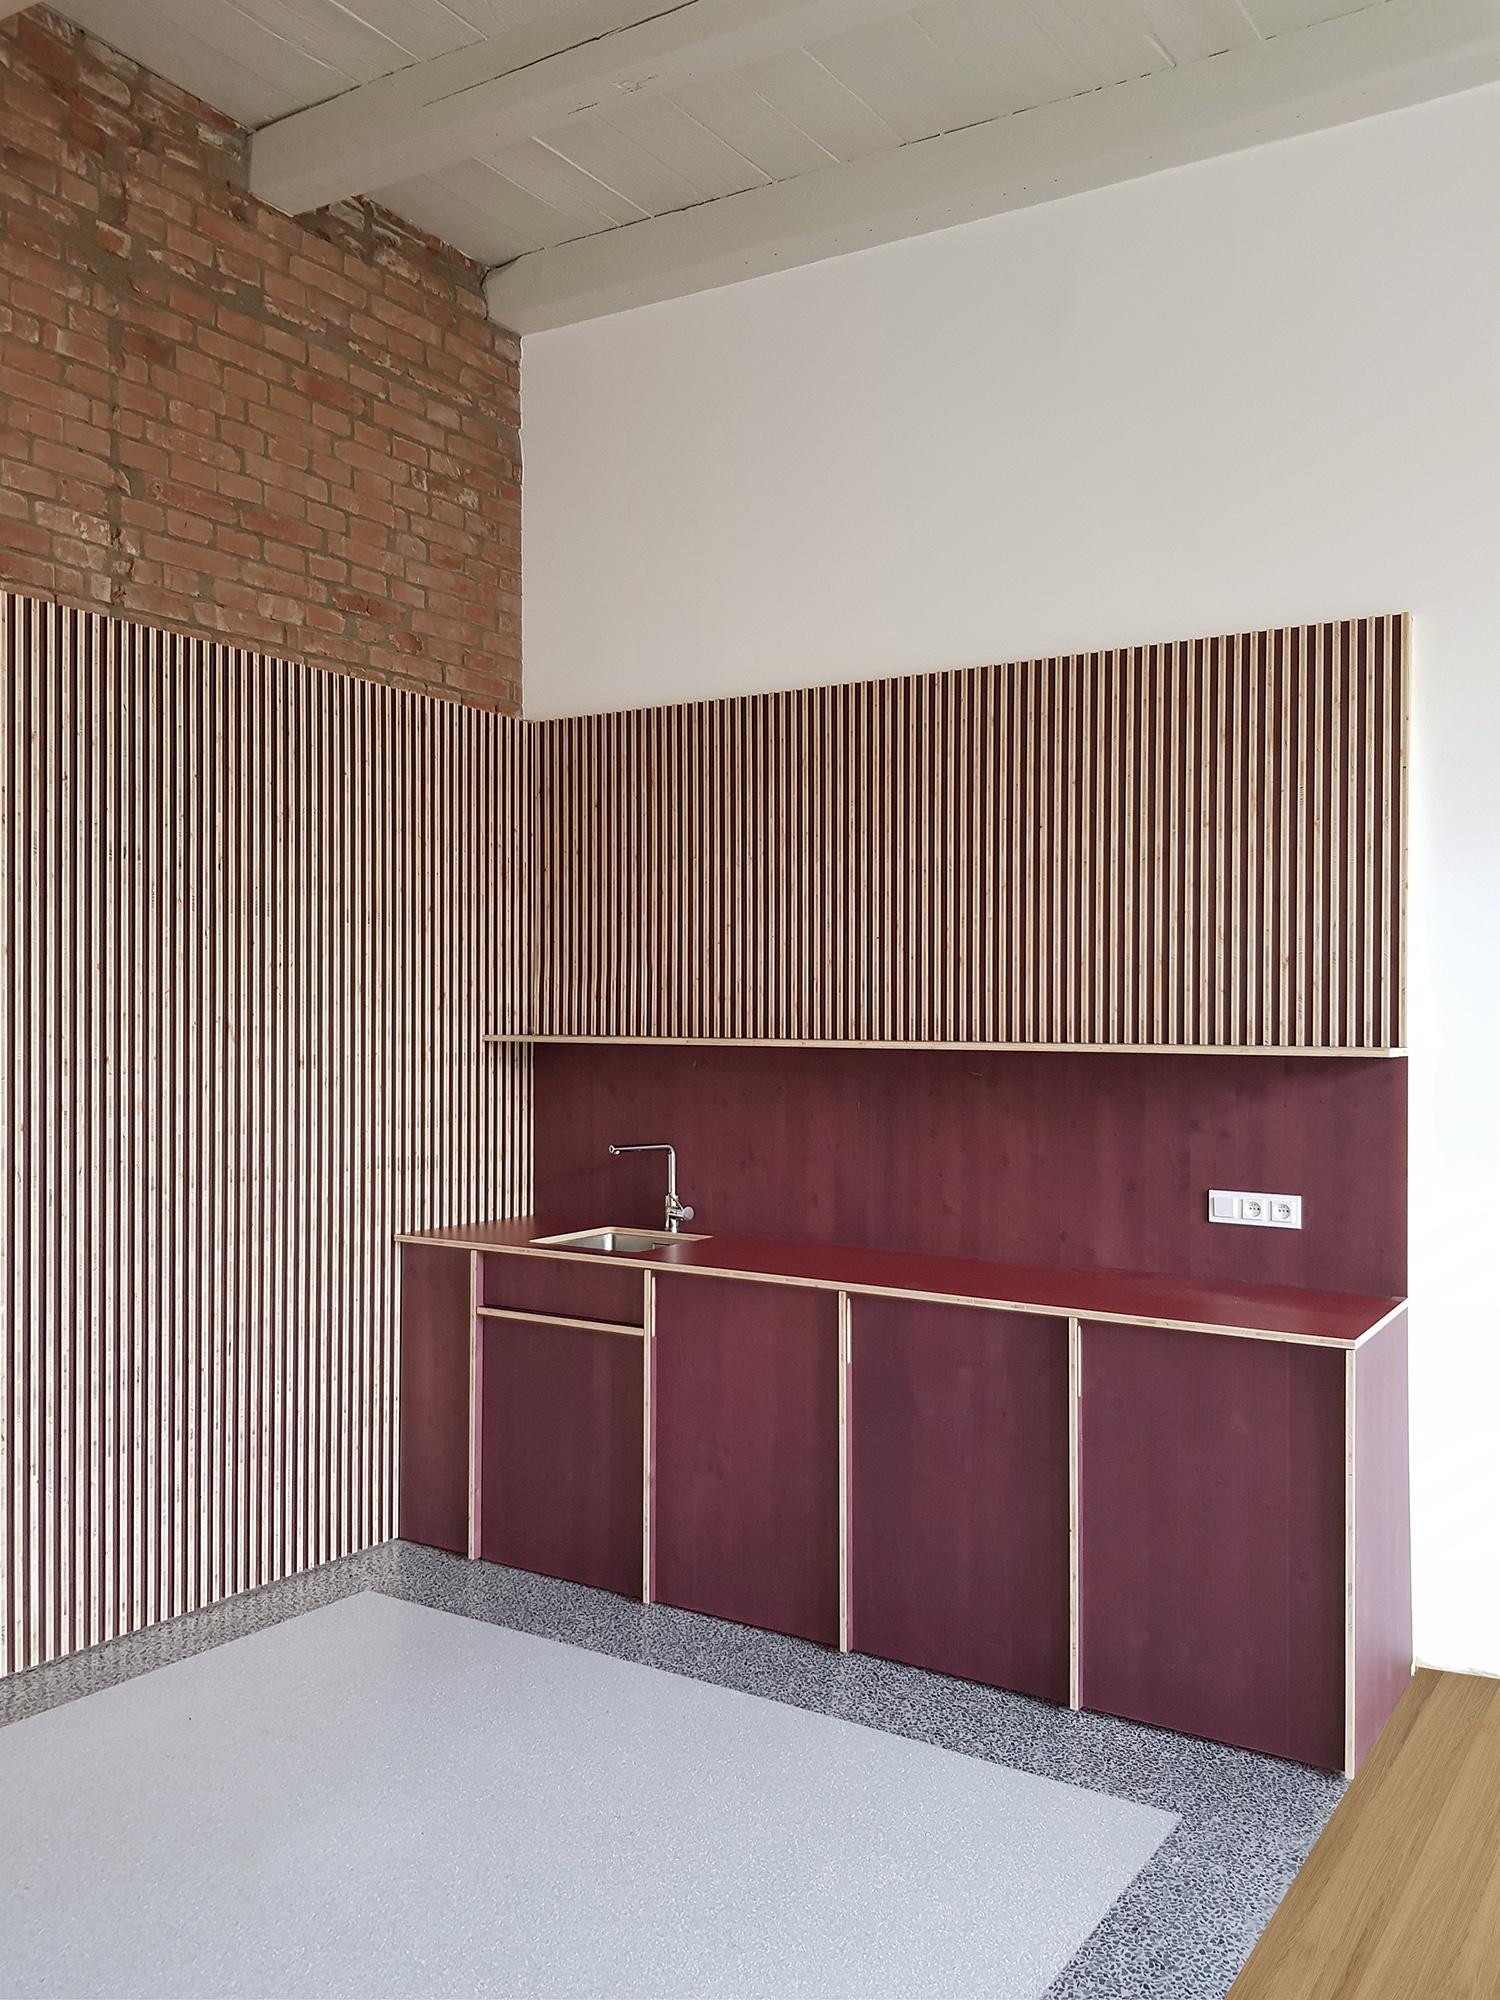 noiz-architekti-bratislava-dom-prilepy-13